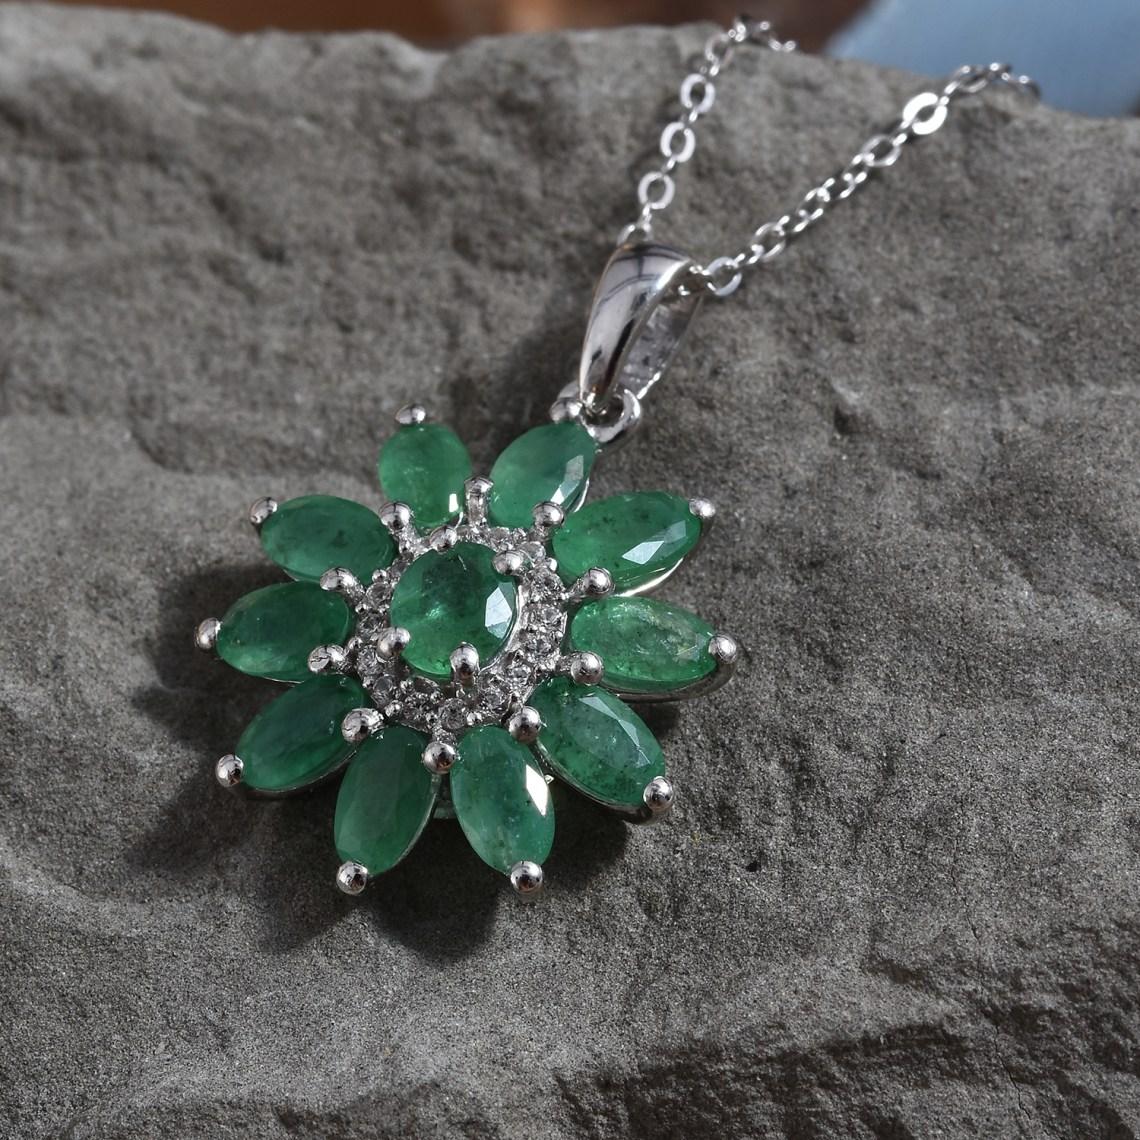 Emerald burst pendant displayed over gray stone background.